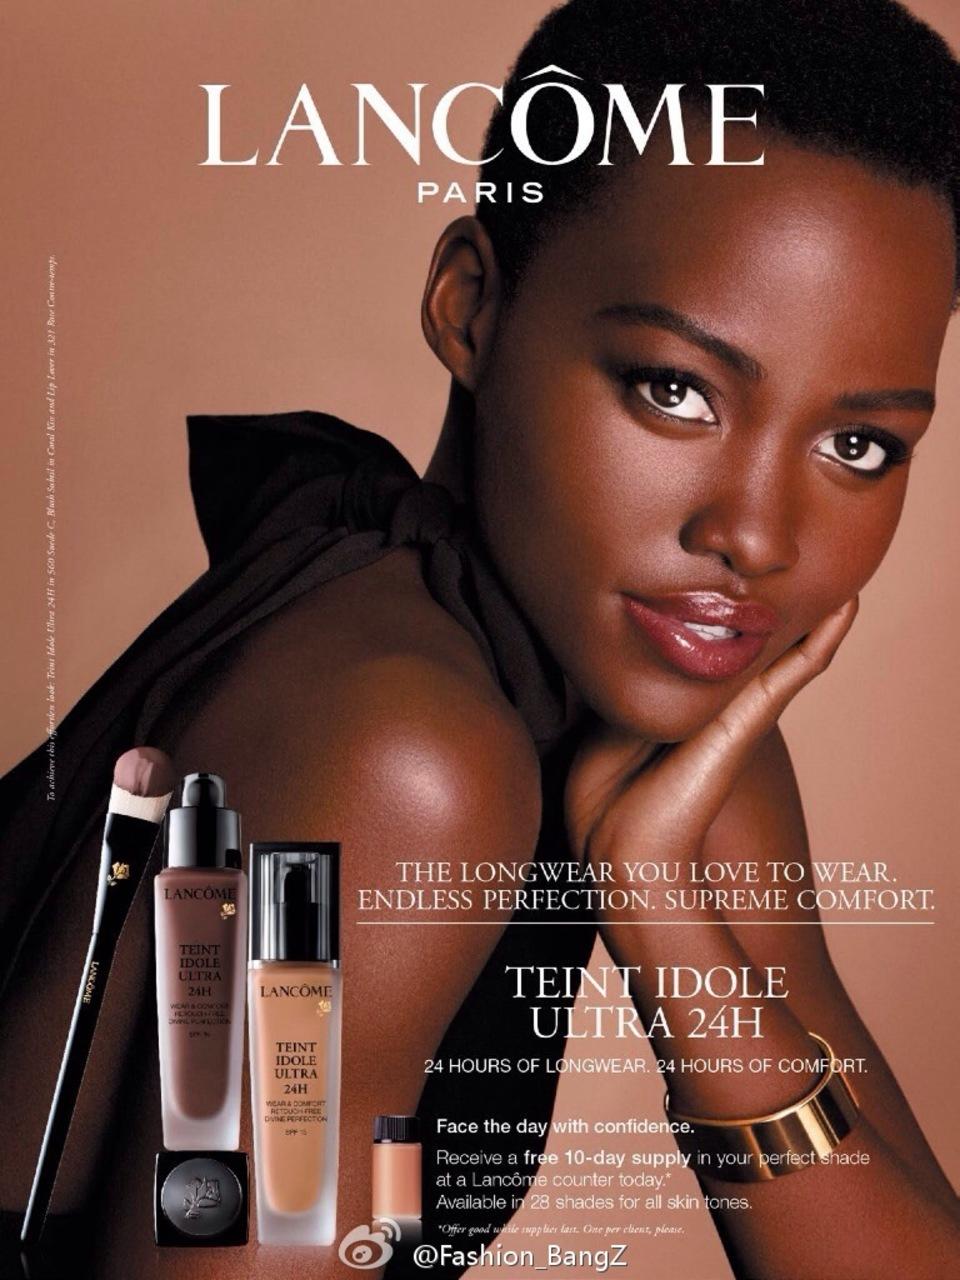 lupita-nyongo-lancome-ad-campaign-photo-2014